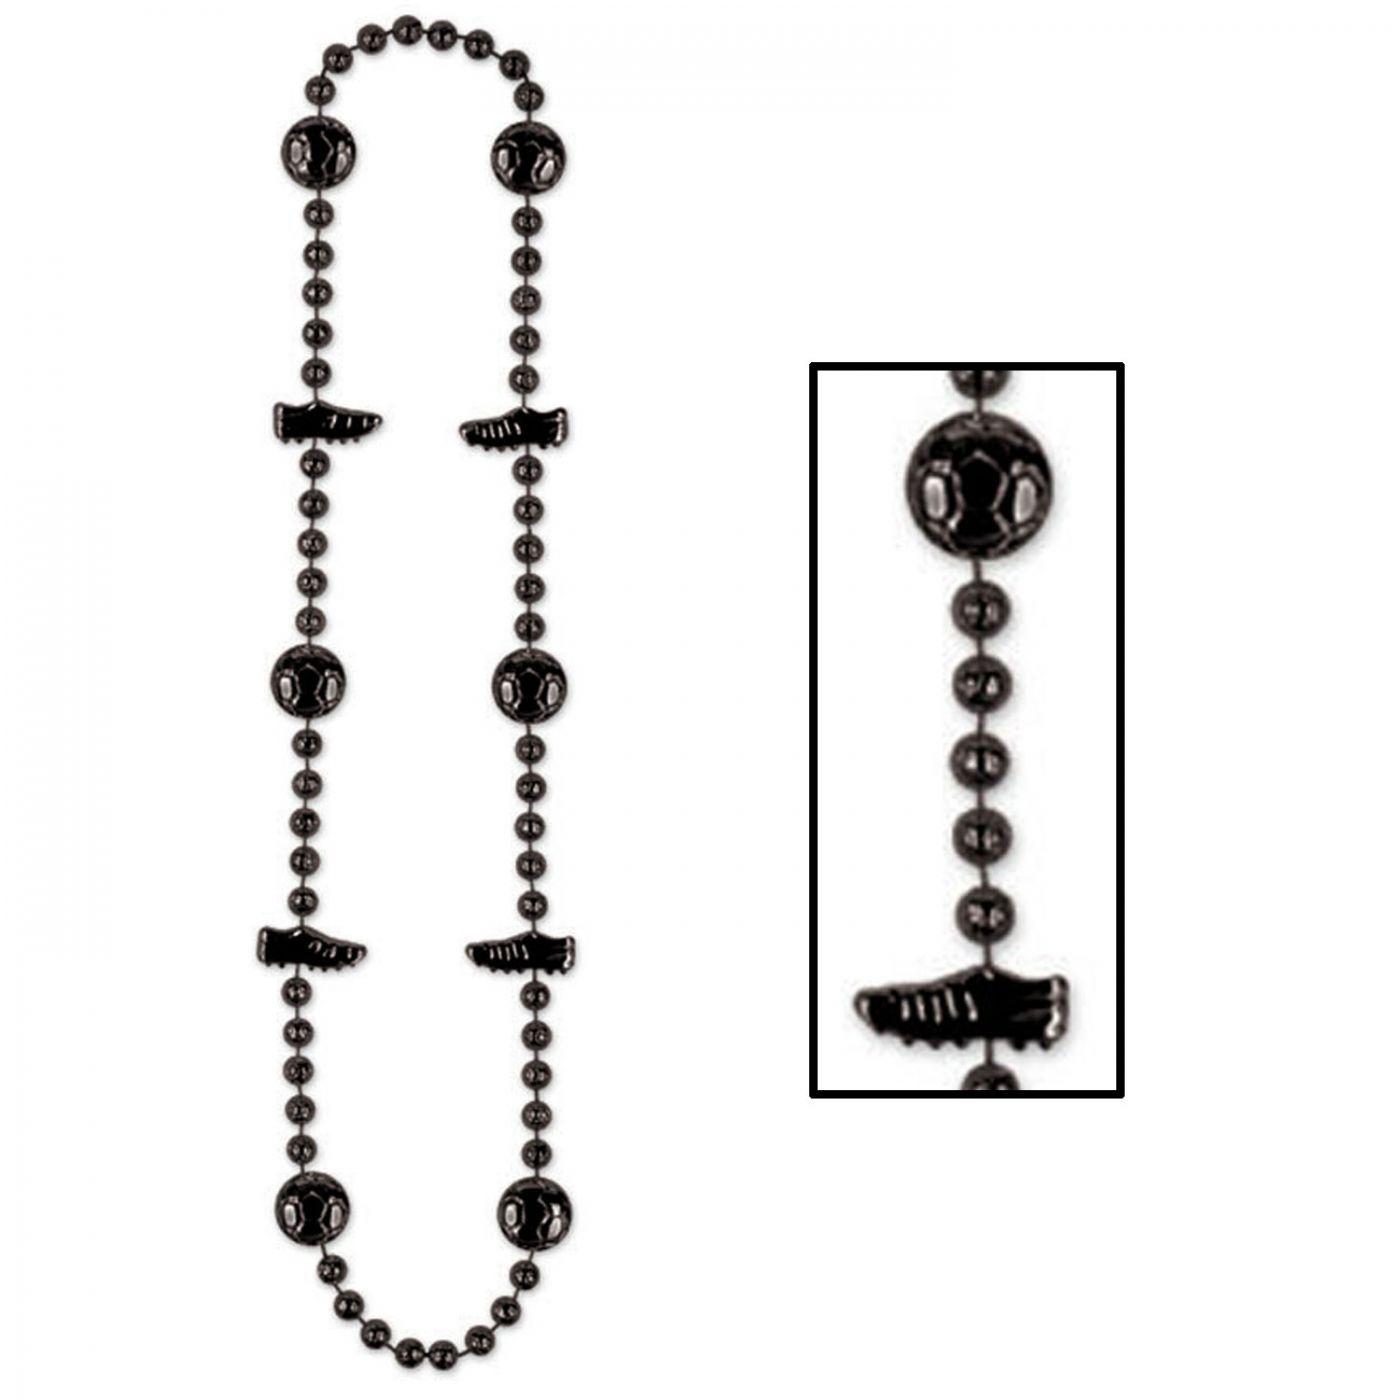 Soccer Beads image